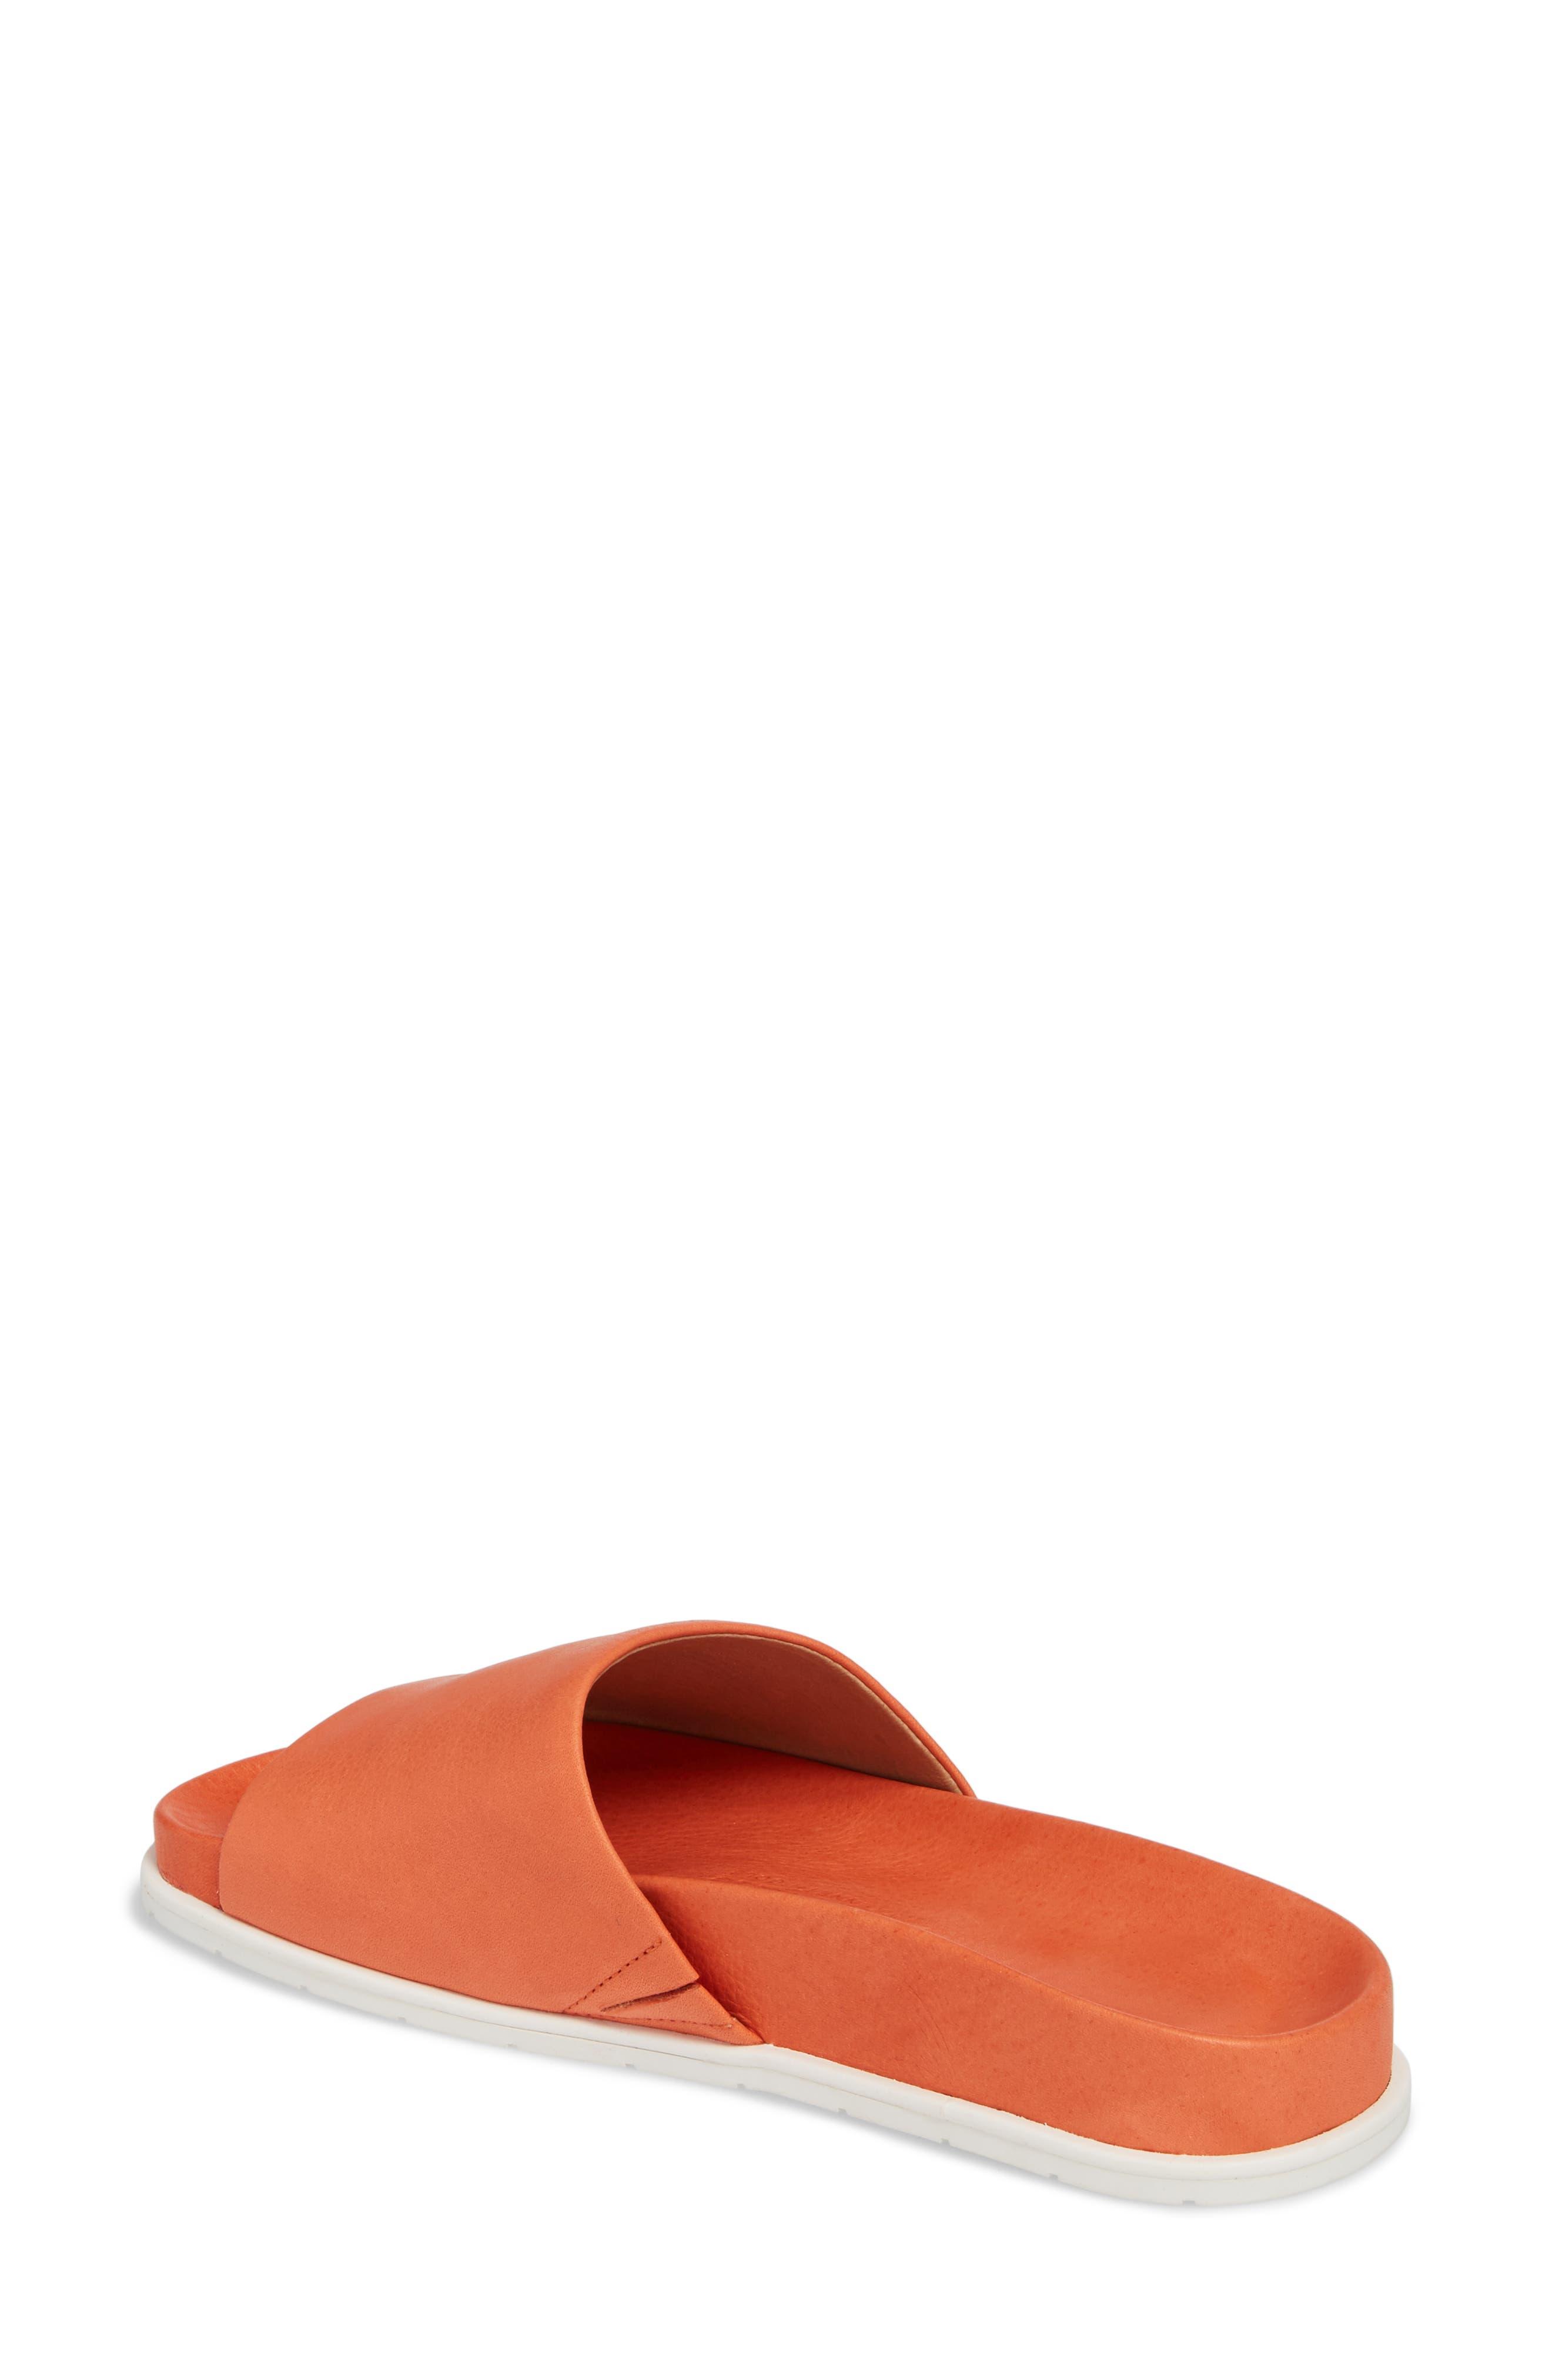 by Kenneth Cole Iona Slide Sandal,                             Alternate thumbnail 2, color,                             Orange Leather